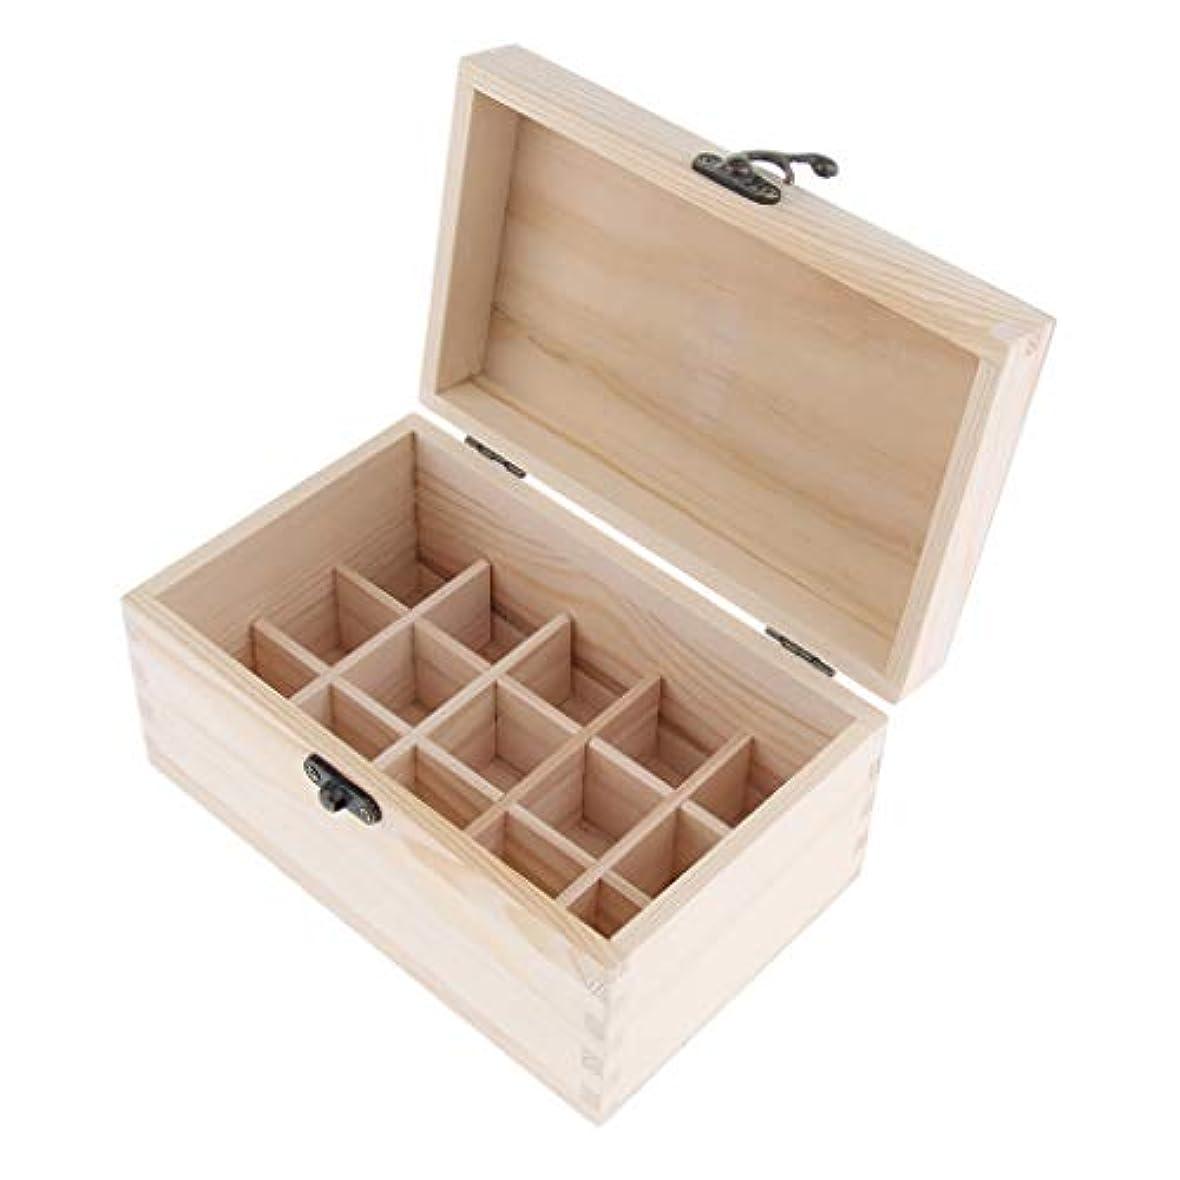 chiwanji 精油ケース 化粧品収納ボックス 15仕切り 木製 エッセンシャルオイル コンパクト 携帯便利 実用性